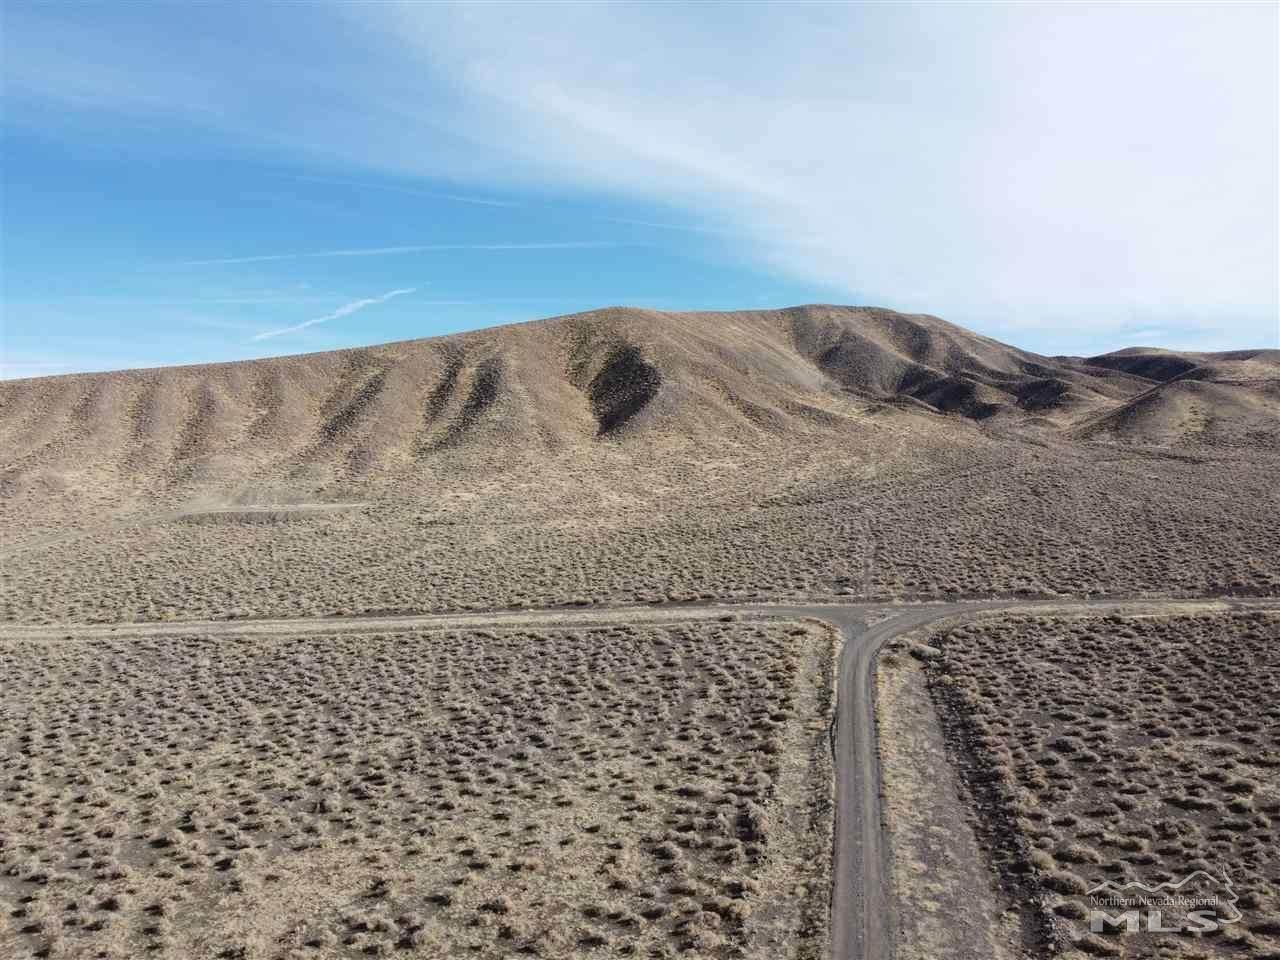 Par 7-C Desert Shadows - Photo 1